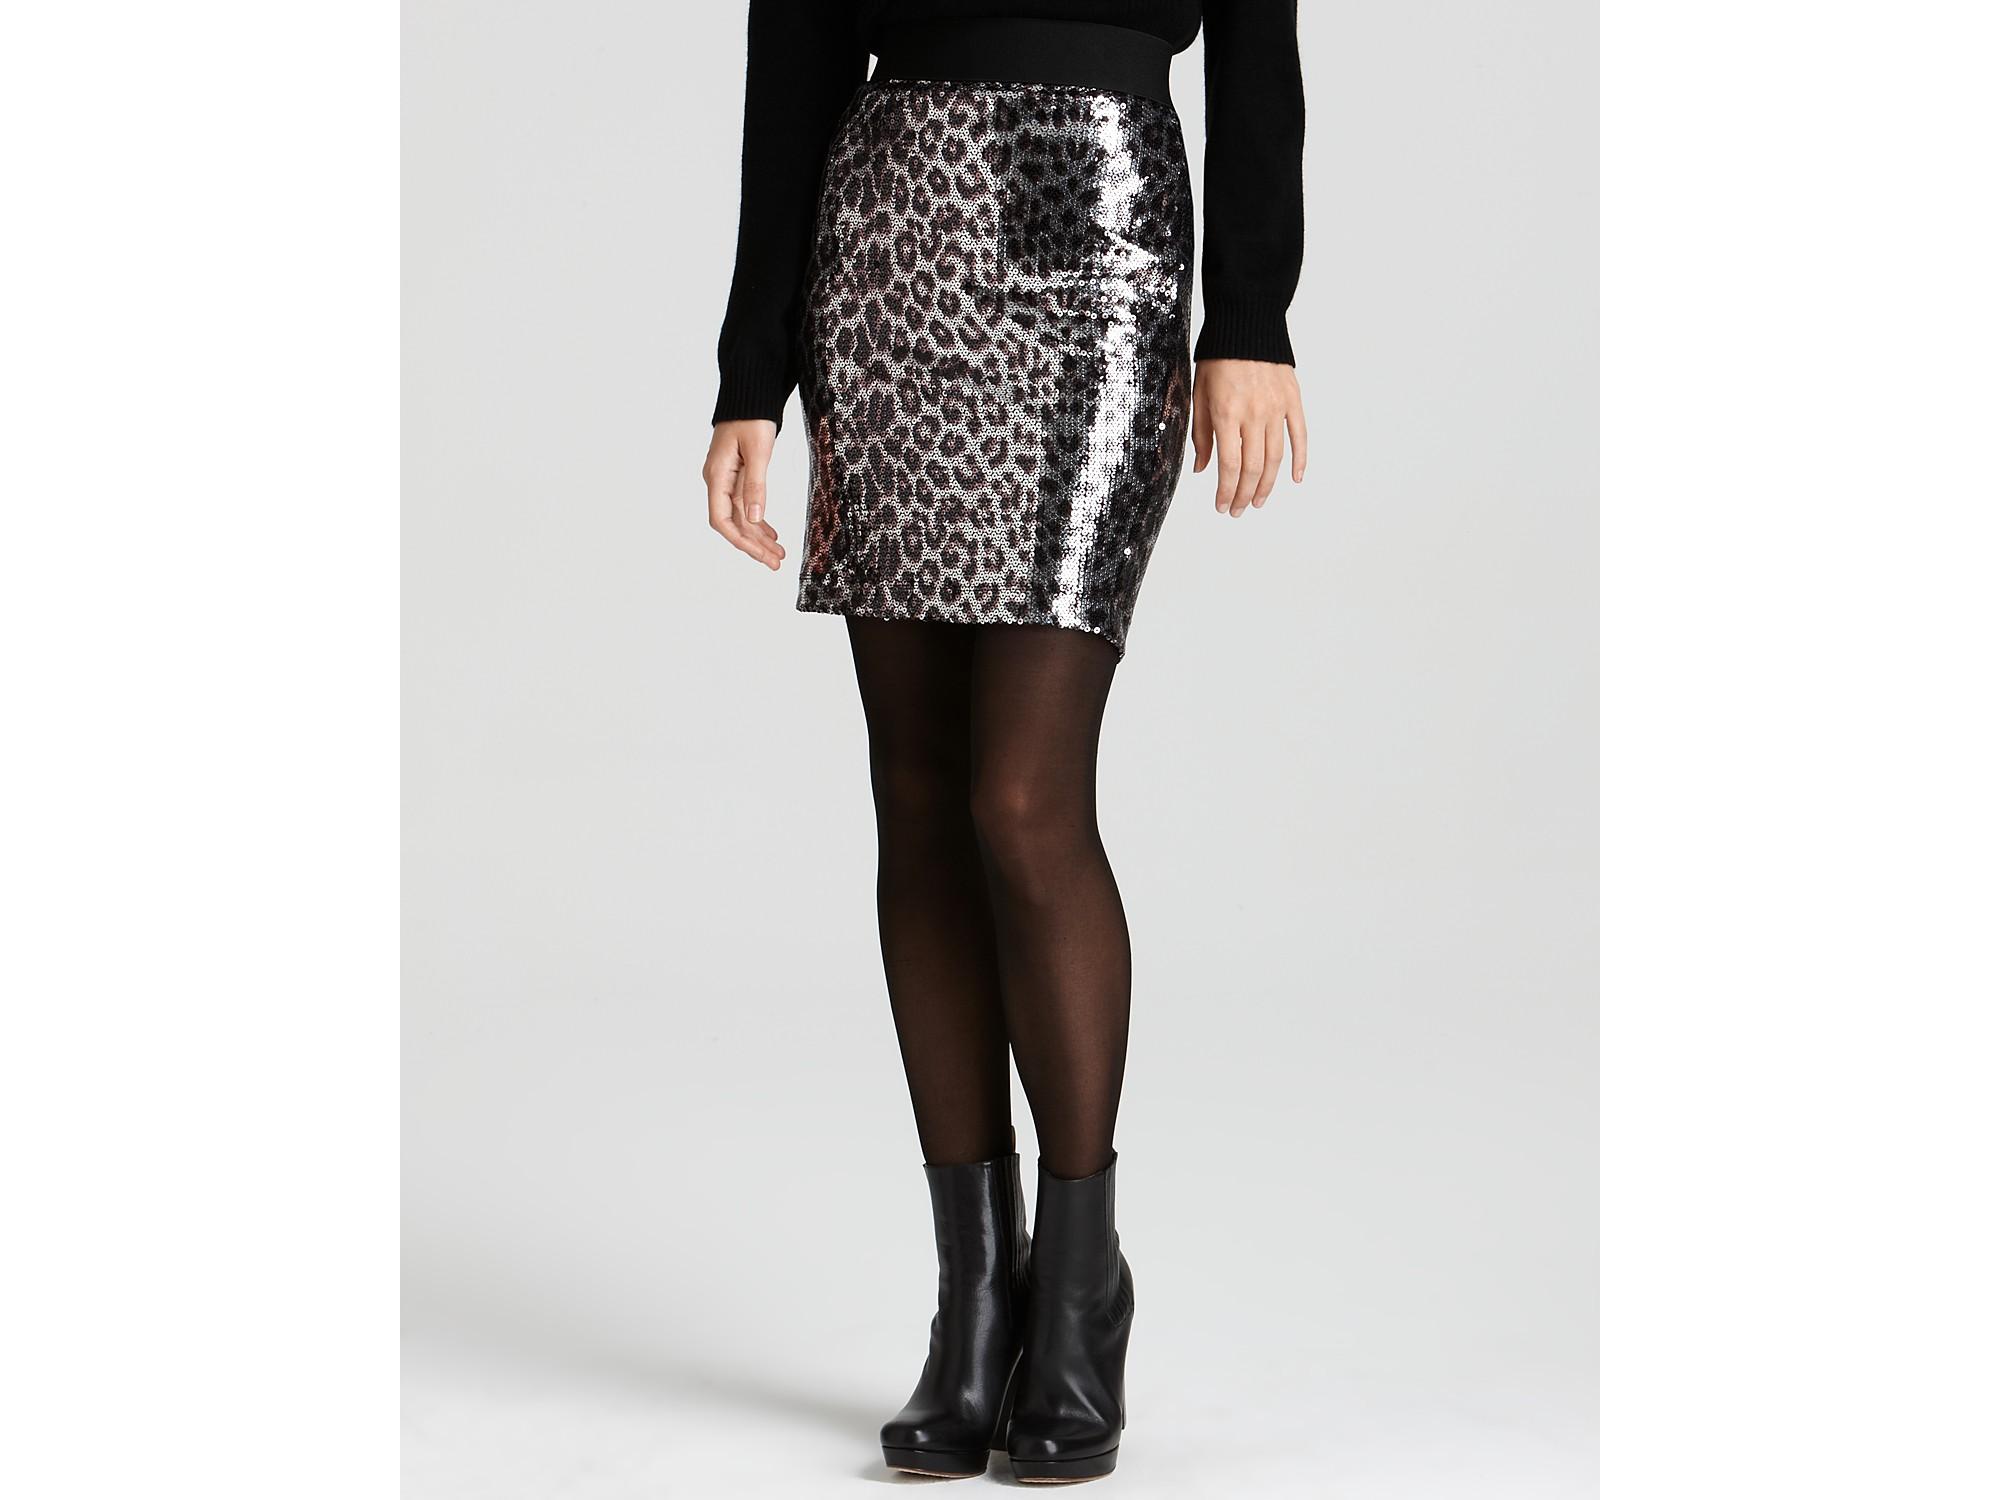 leopard sequin pencil skirt in silver cheetah